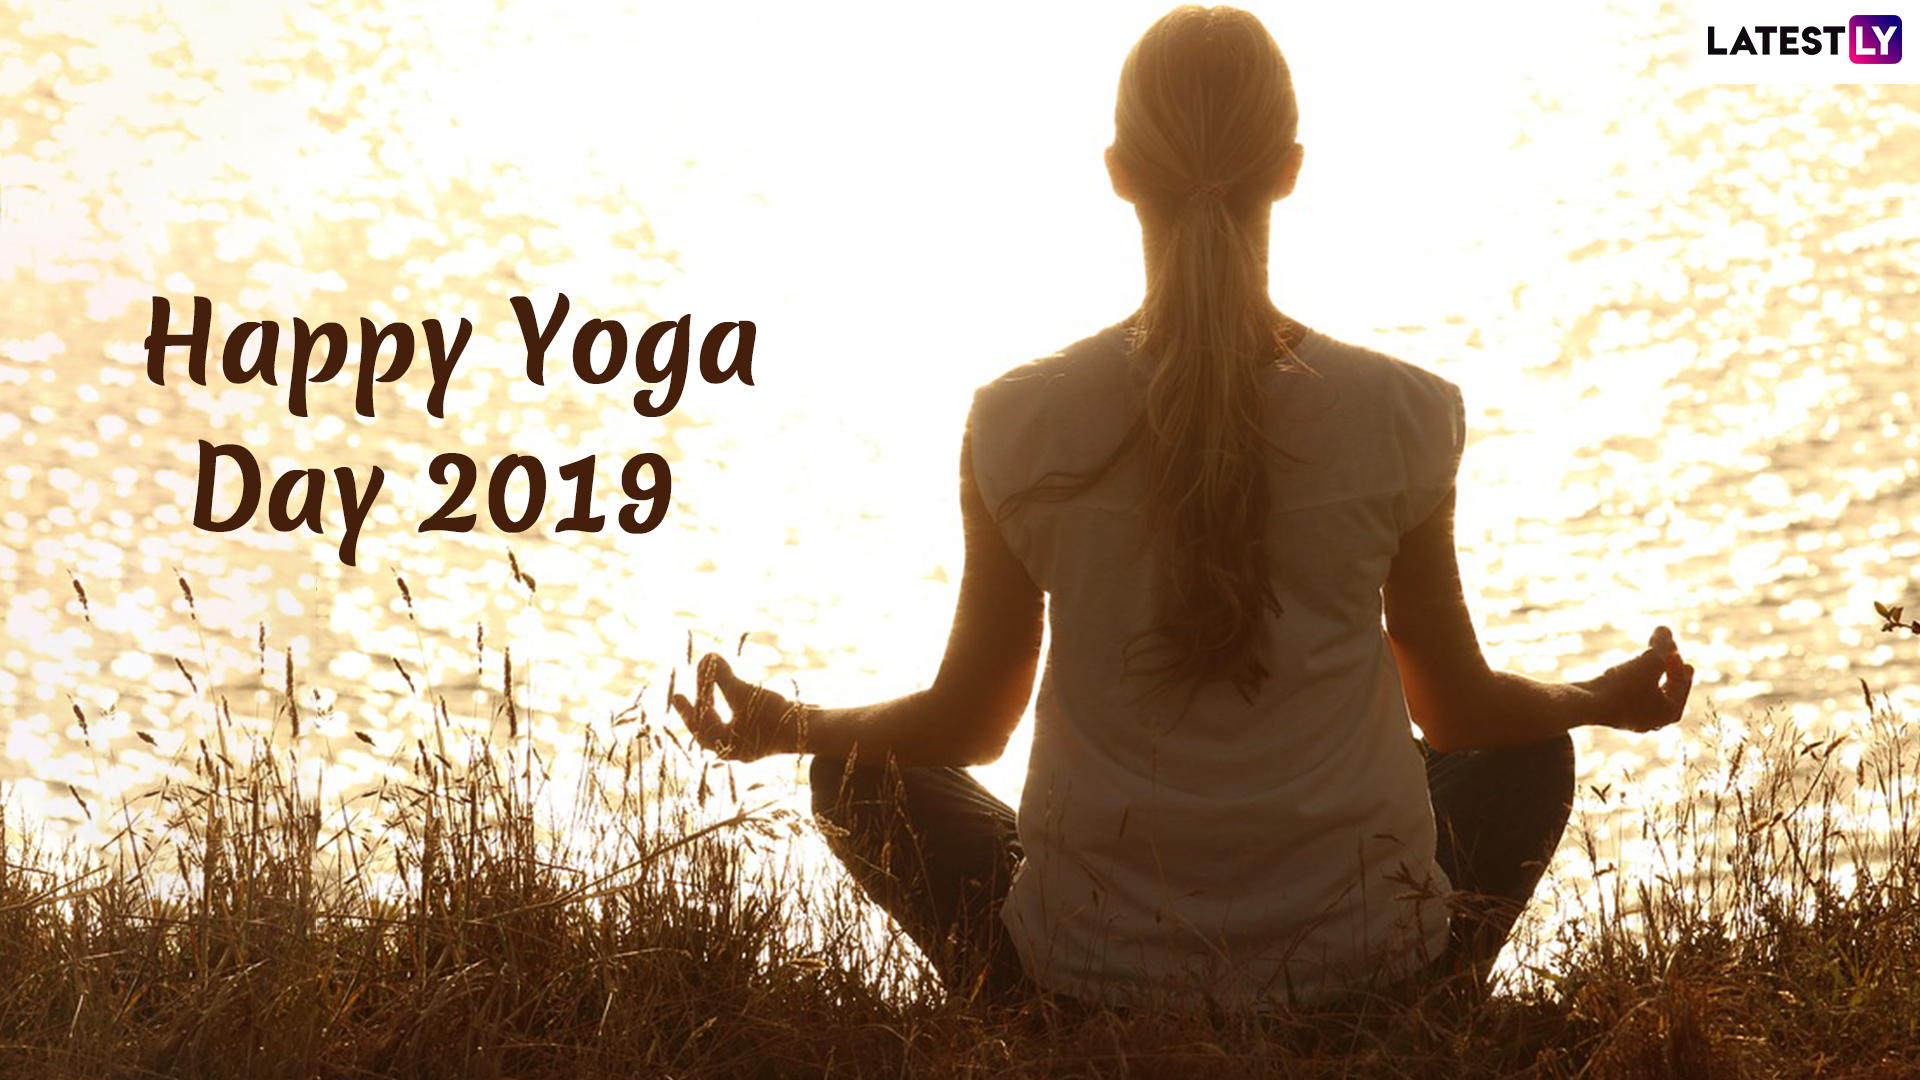 happy international yoga day 2019 photo credits file image